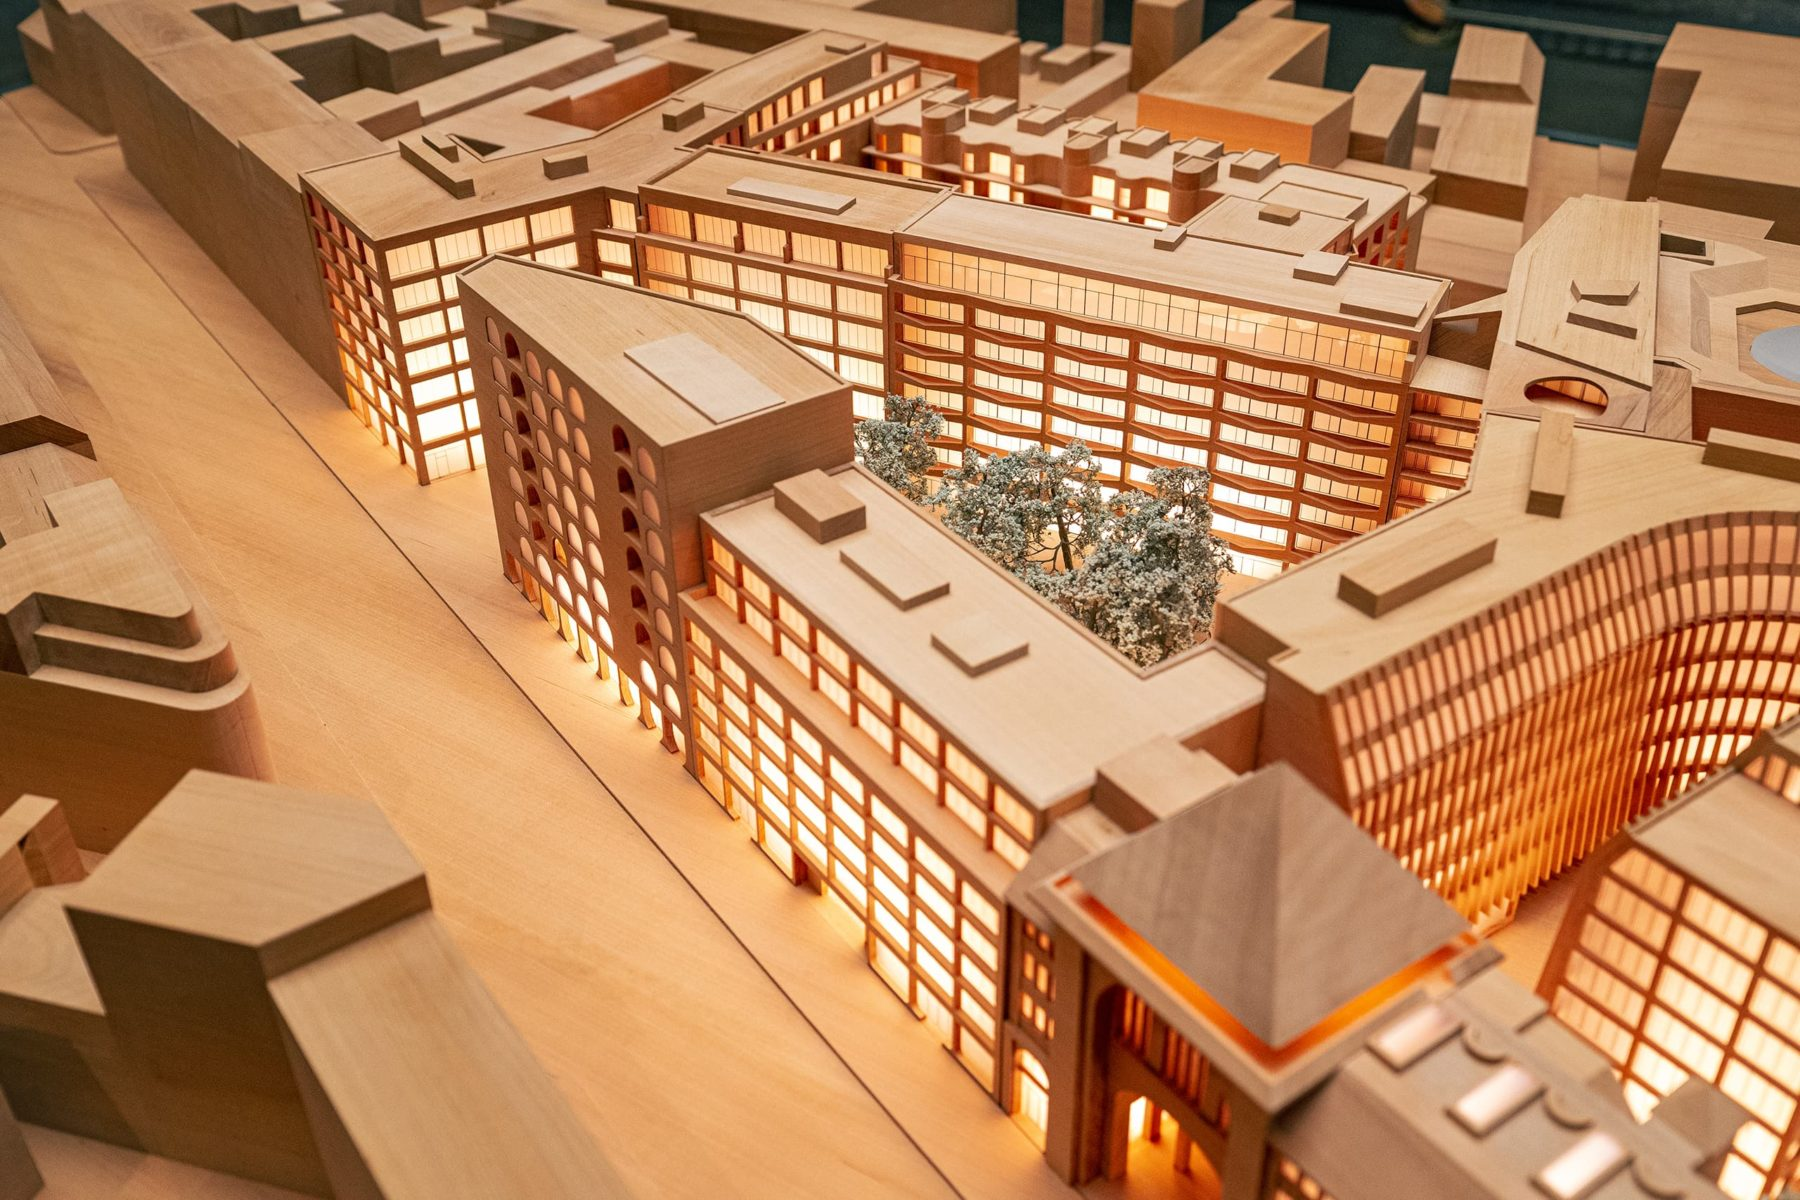 Stadtteilmodell Berlin aus Holz, Nahaufnahme auf Immobilienprojekt Am Tacheles